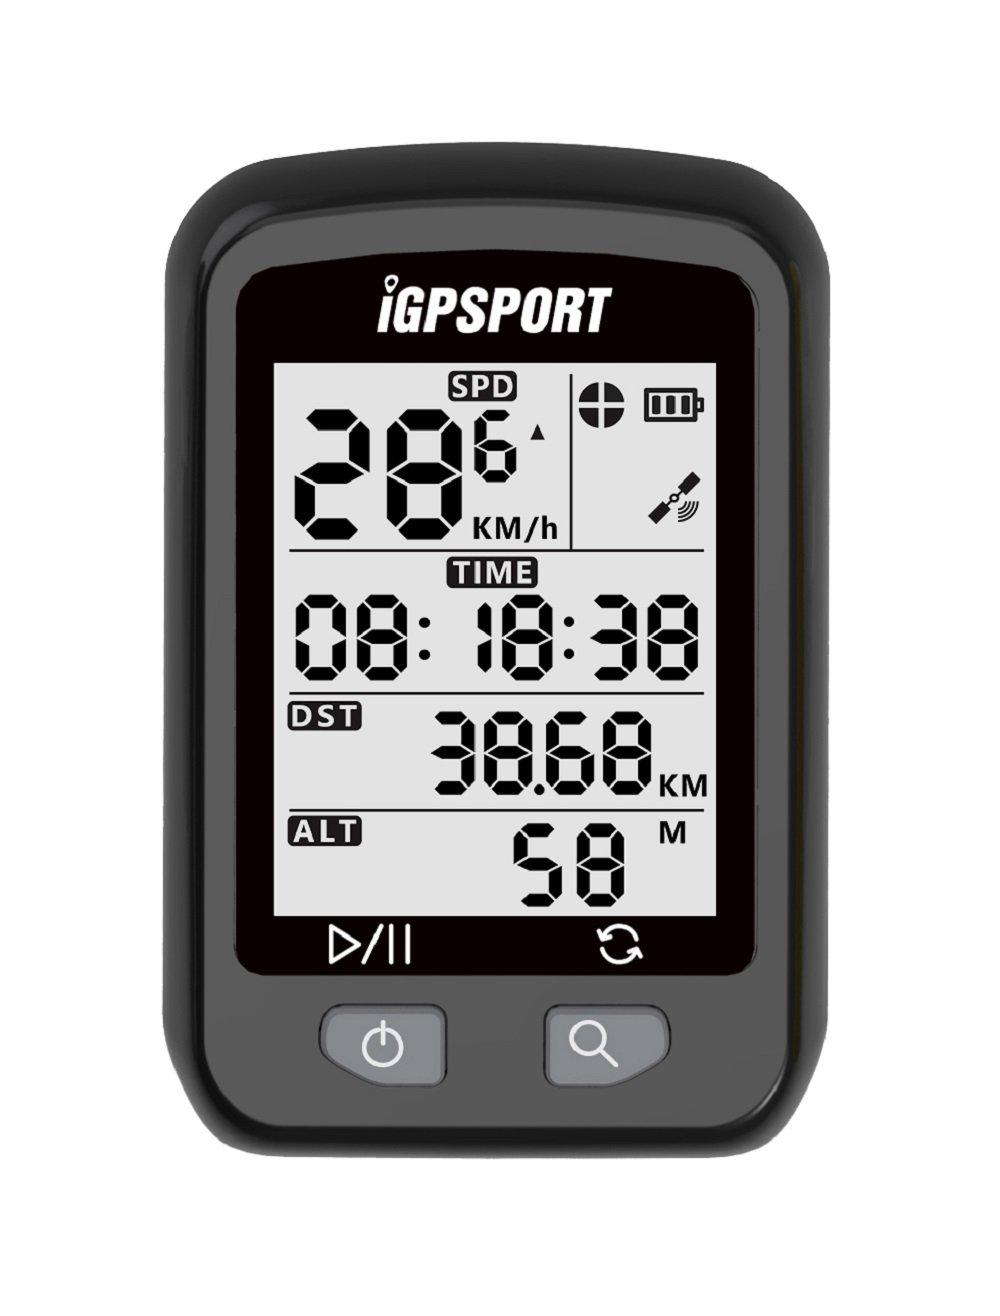 iGPSPORT GPS Cycling Computer 20E Wireless Waterproof Speedometer Odometer by iGPSPORT (Image #1)